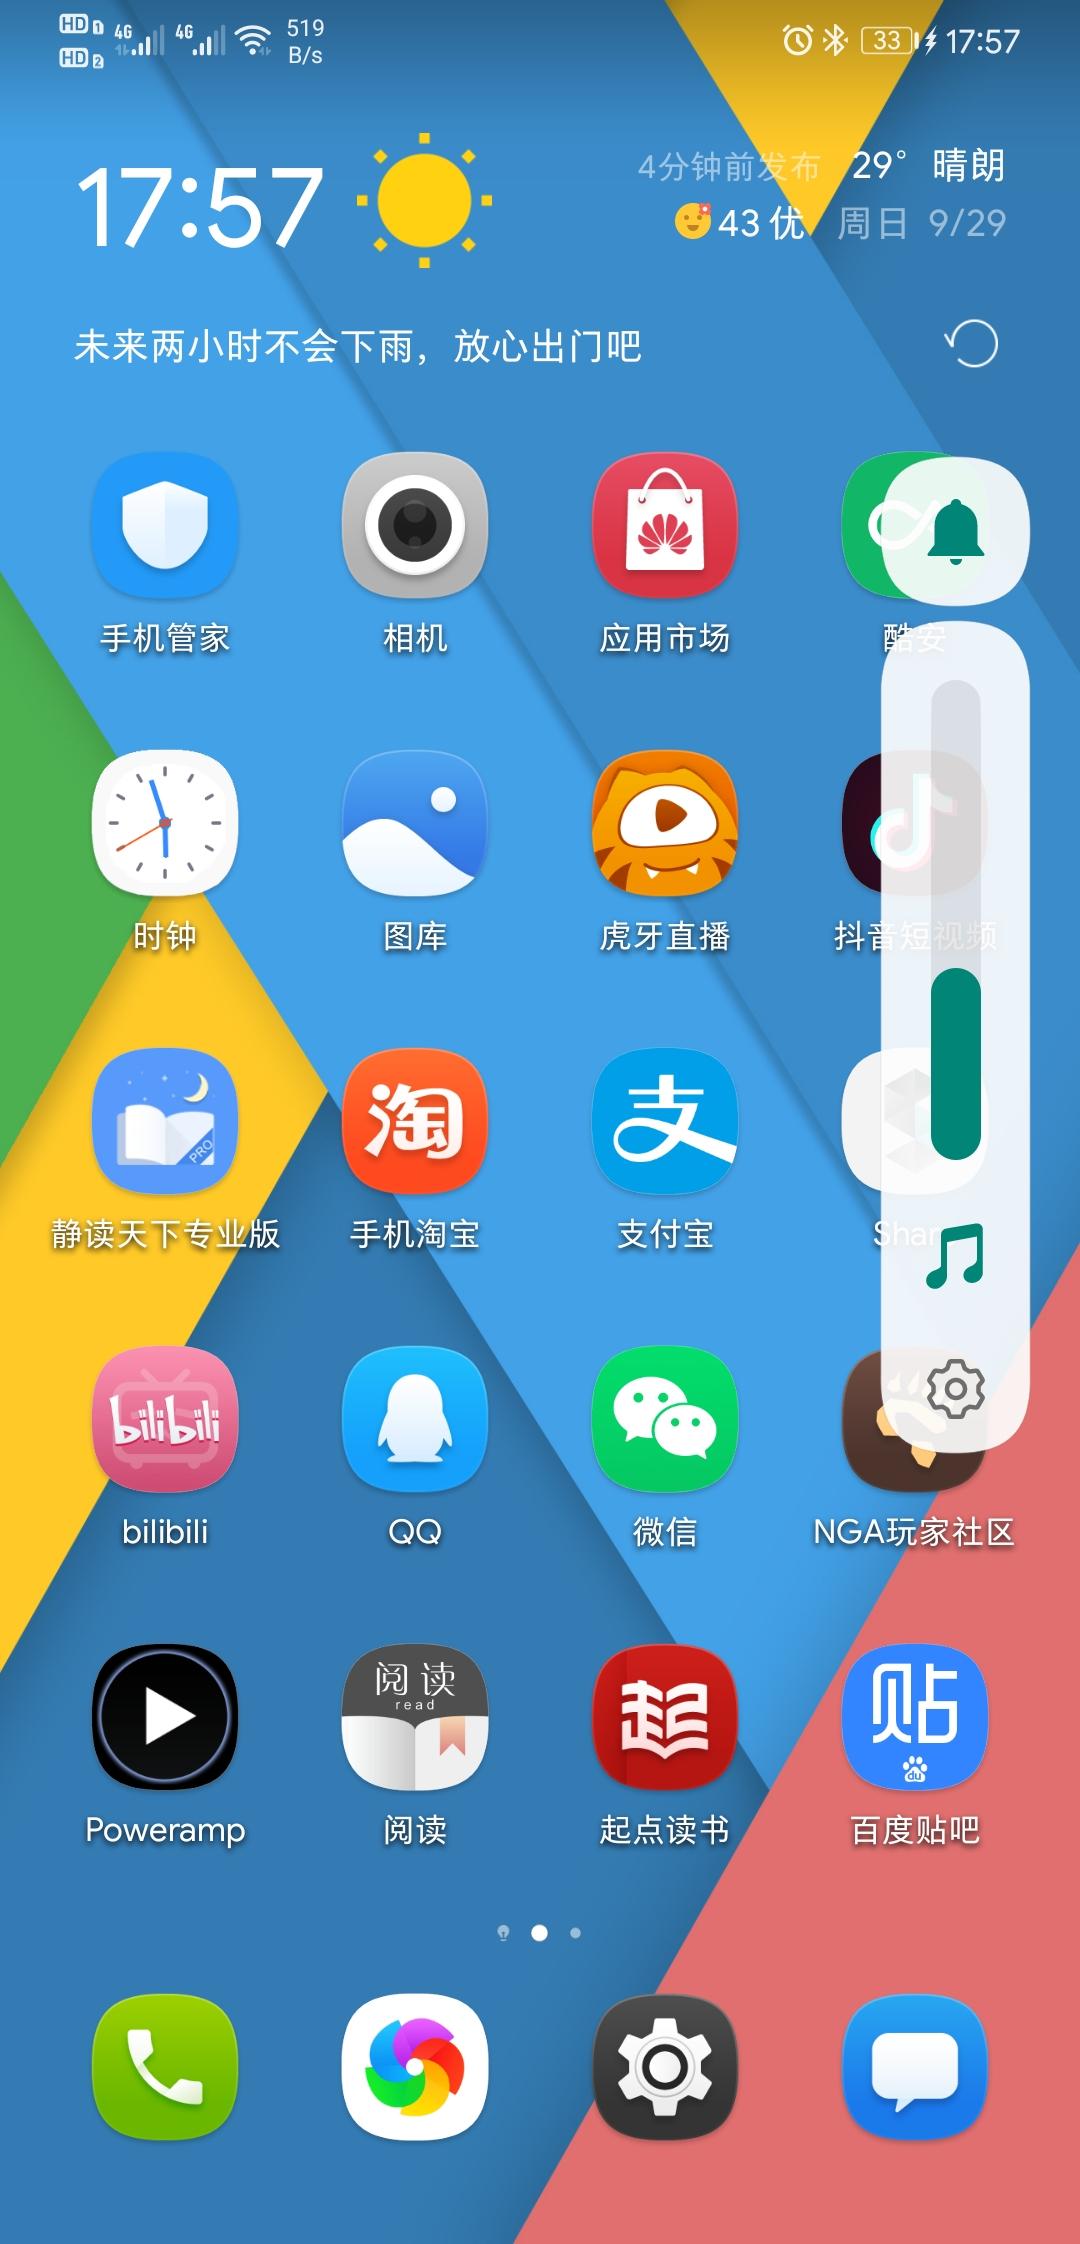 Screenshot_20190929_175741_com.huawei.android.lau.jpg